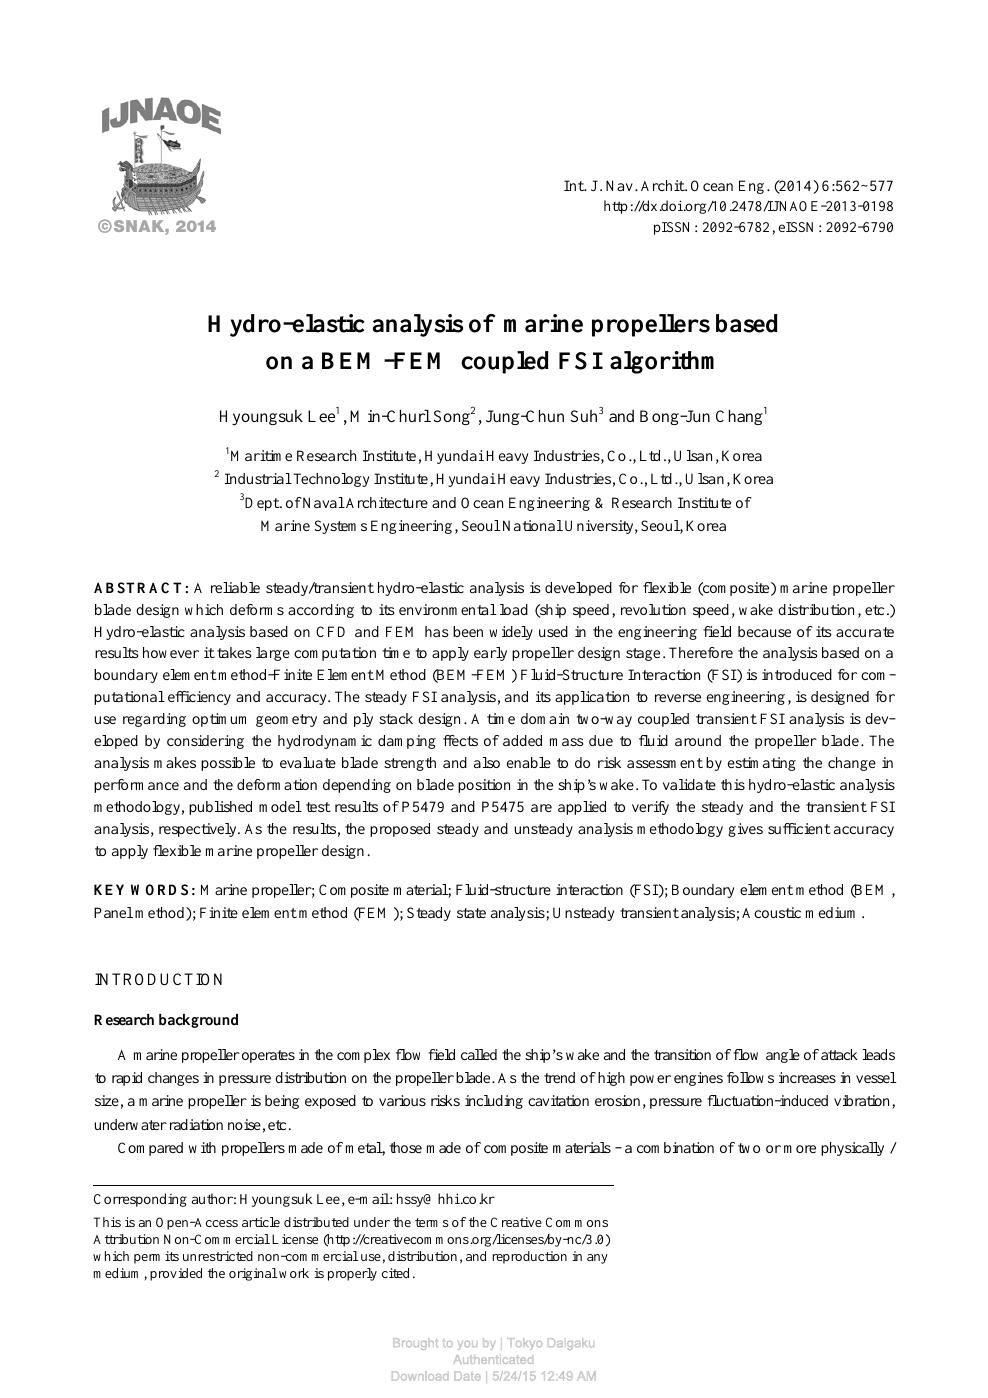 Hydro-elastic analysis of marine propellers based on a BEM